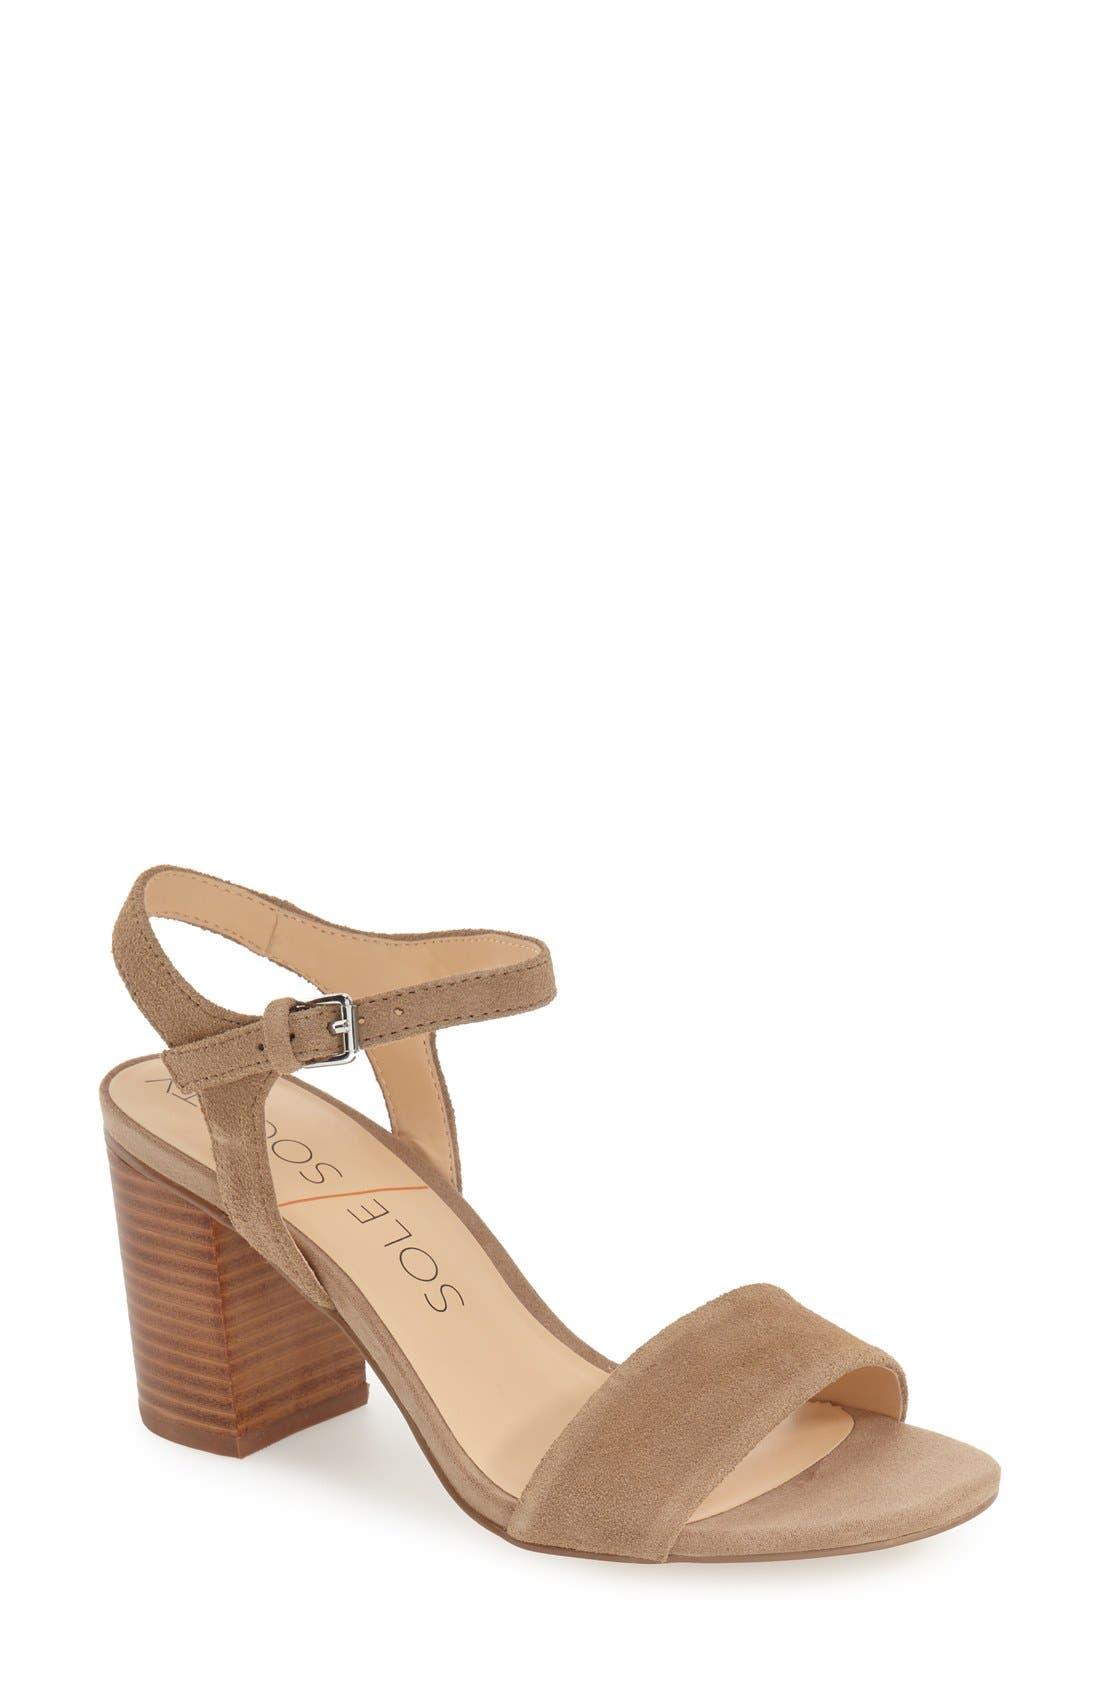 'Linny' Ankle Strap Sandal,                             Main thumbnail 3, color,